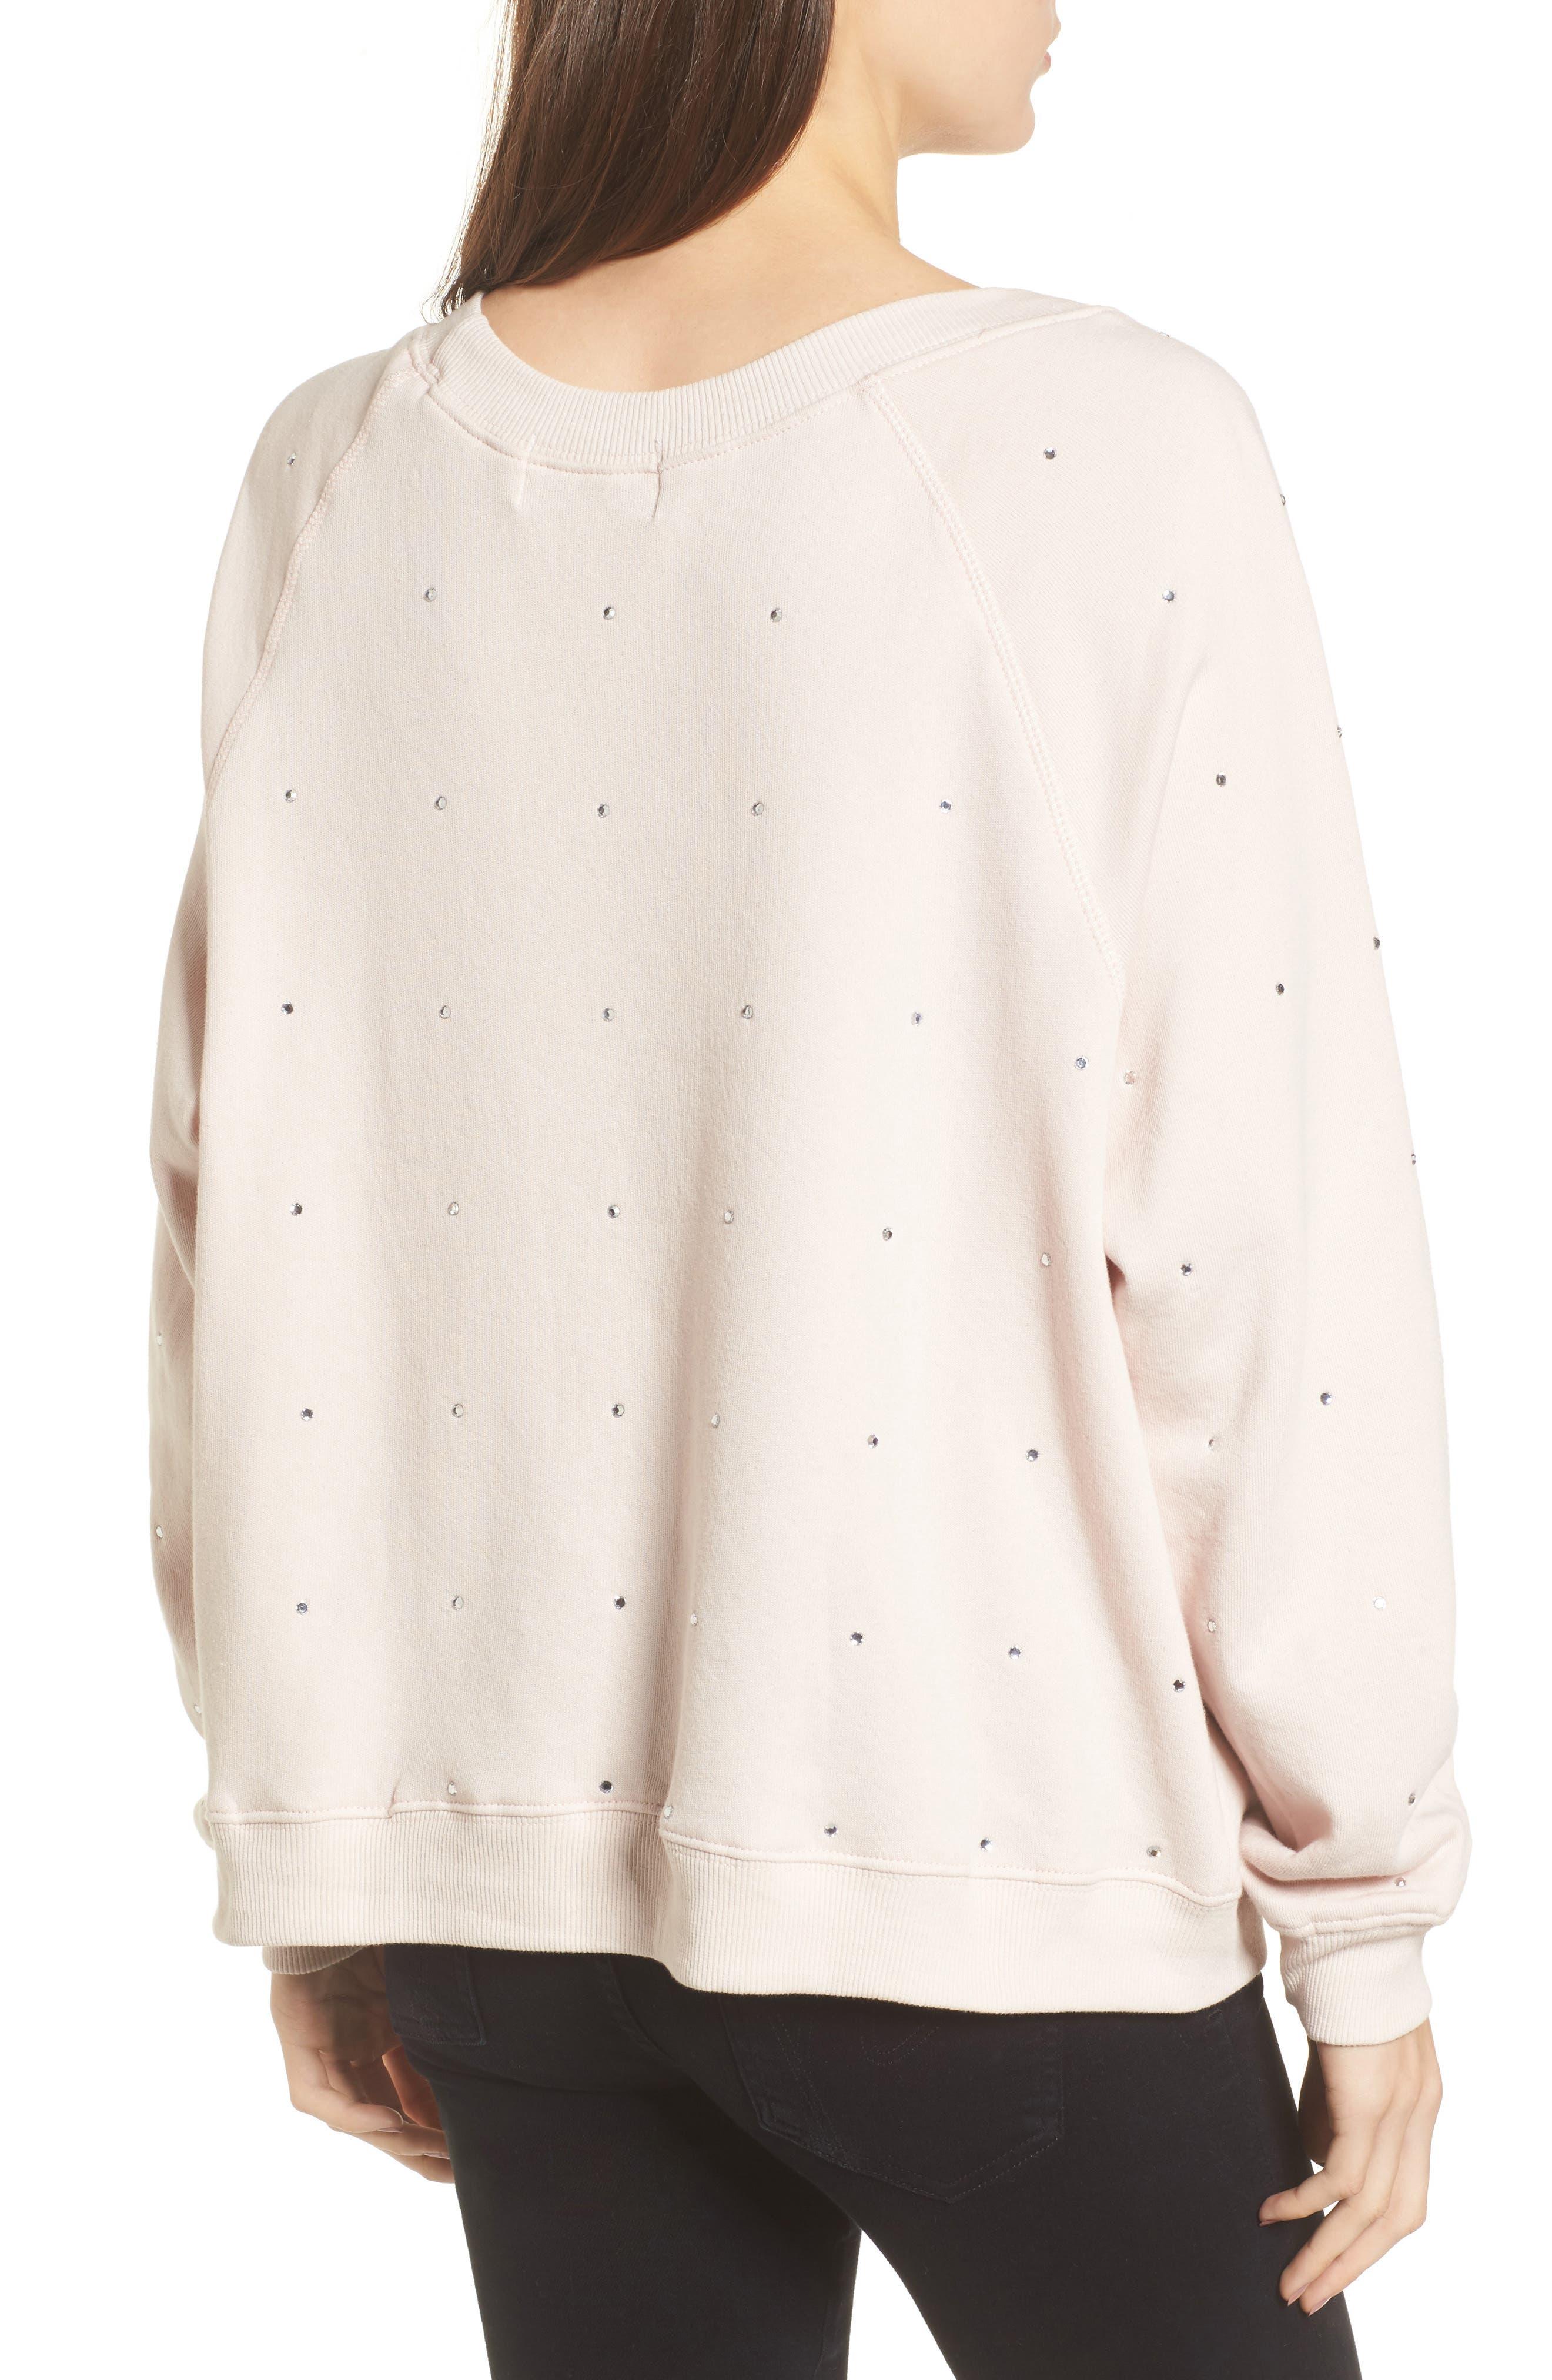 Glitz Sweatshirt,                             Alternate thumbnail 2, color,                             Iced Lavender